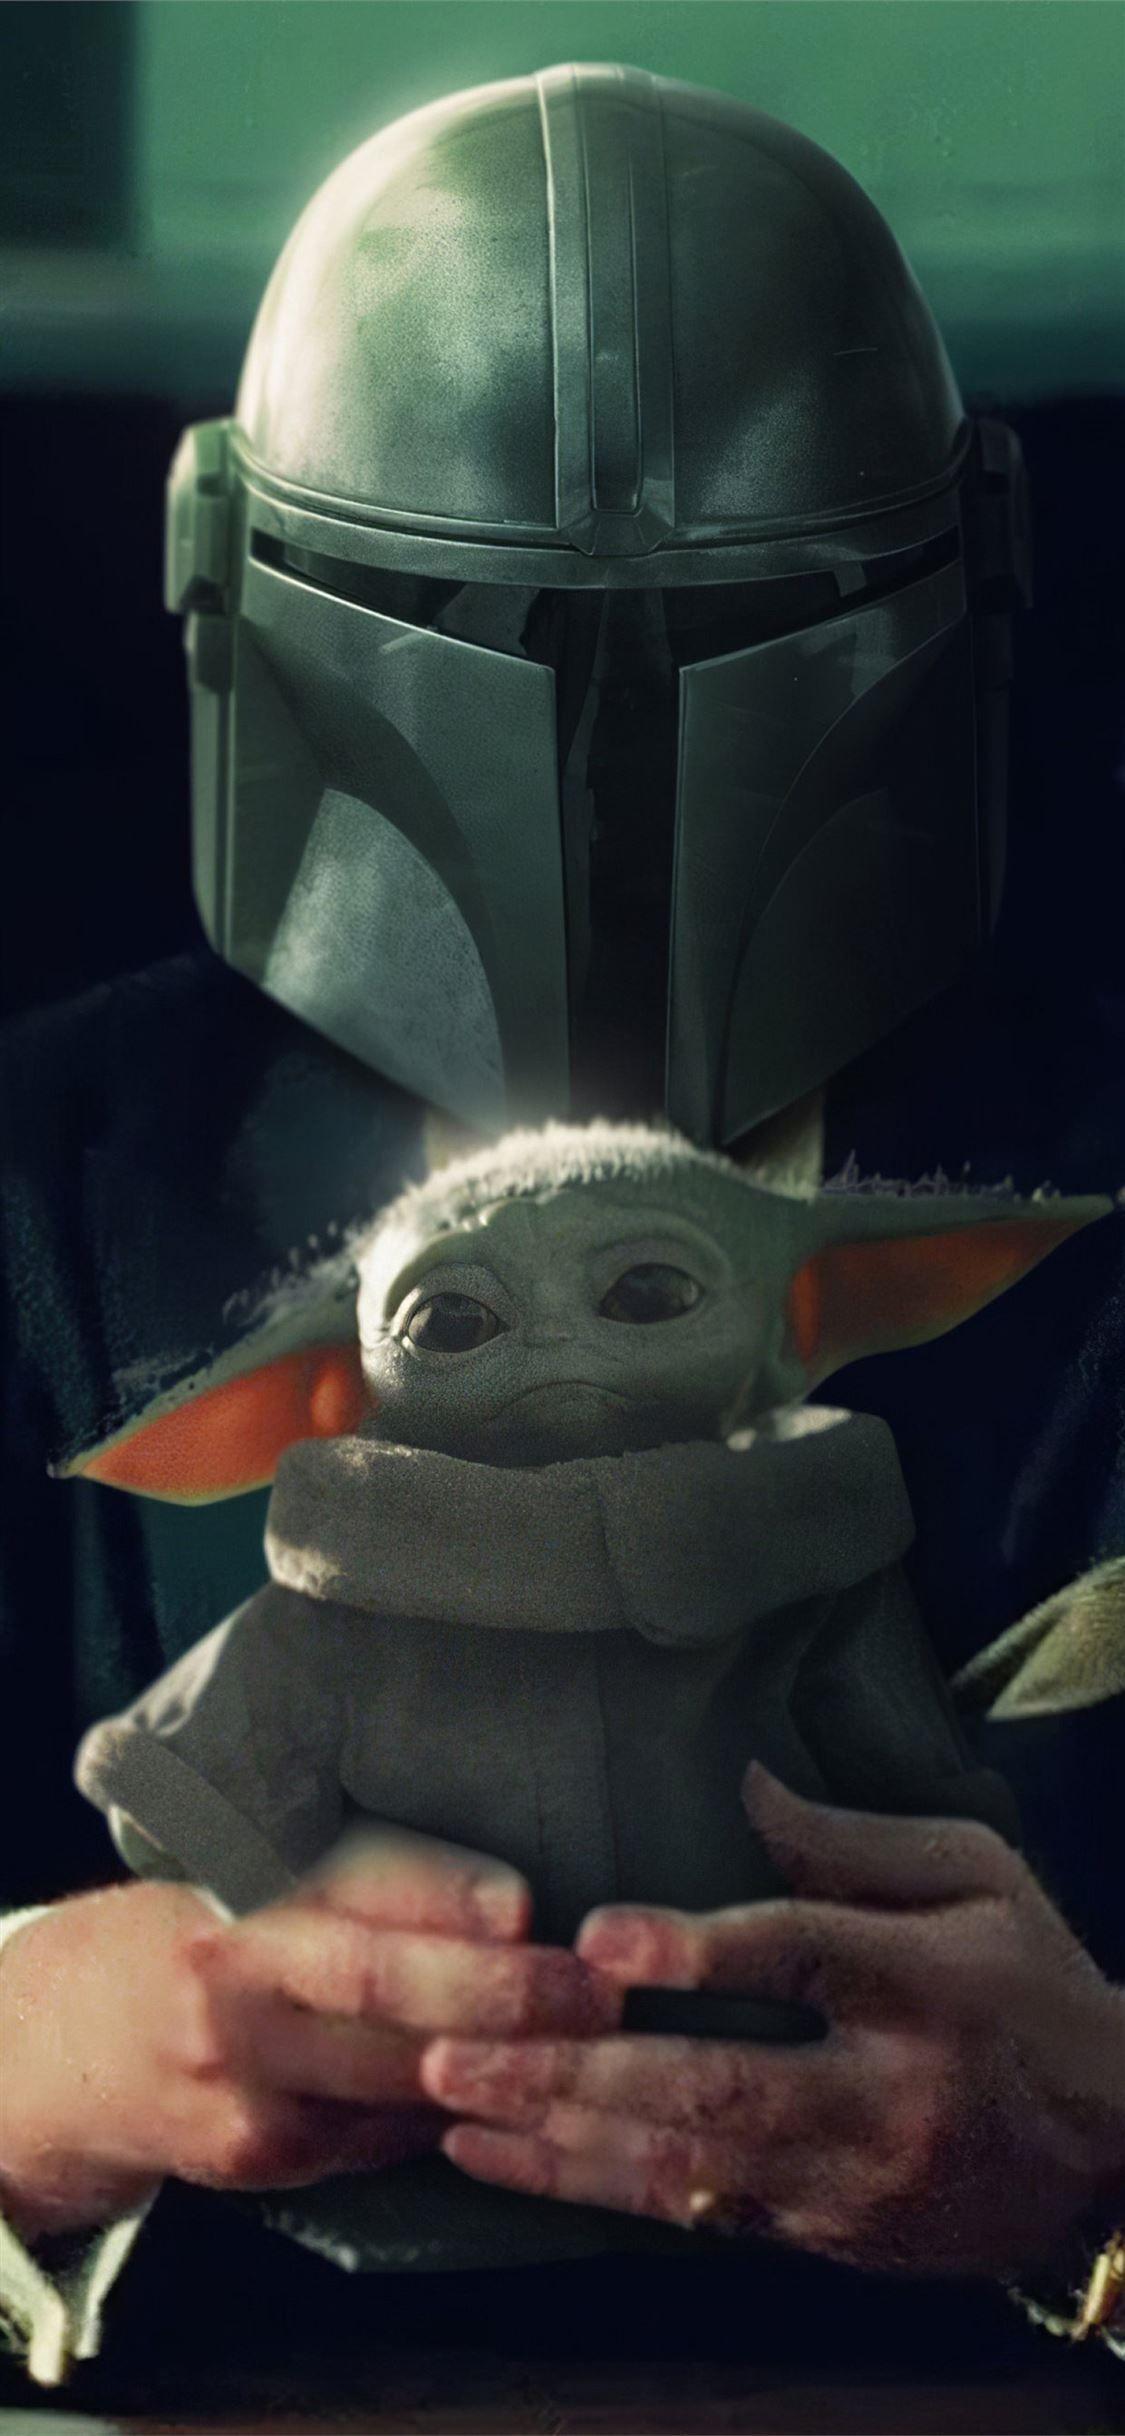 The Mandalorian Yoda 4k Themandalorian Tvshows Starwars 4k Babyyoda Movies Iphone11wallpaper Mandalorian Star Wars Star Wars Background